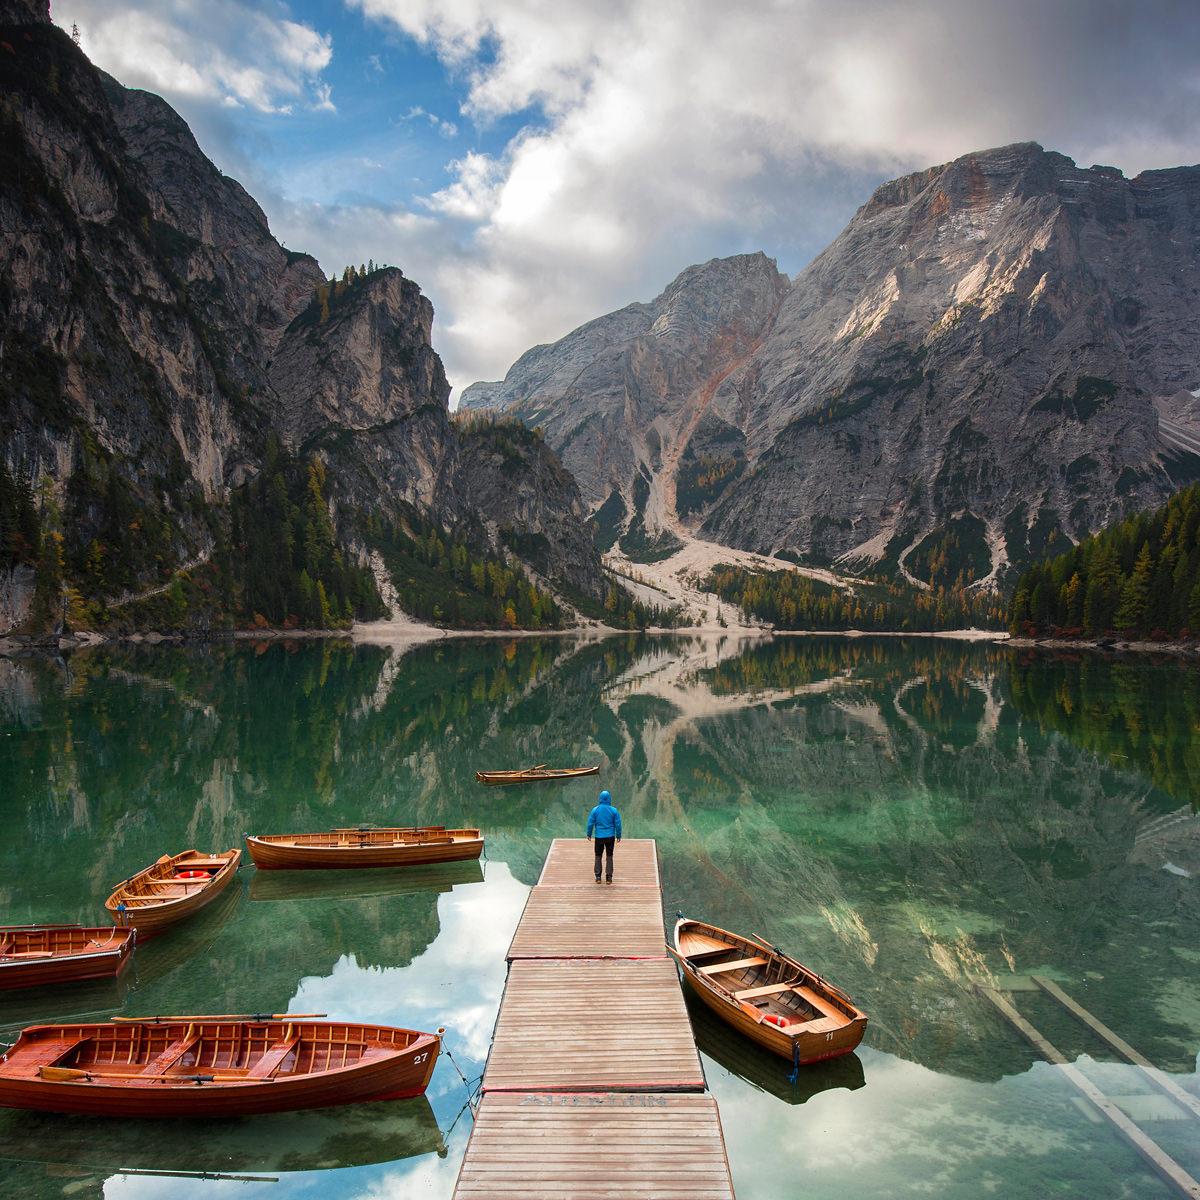 lago di braies, marcin kesek fotograf krajobrazu, fotografia krajobrazowa